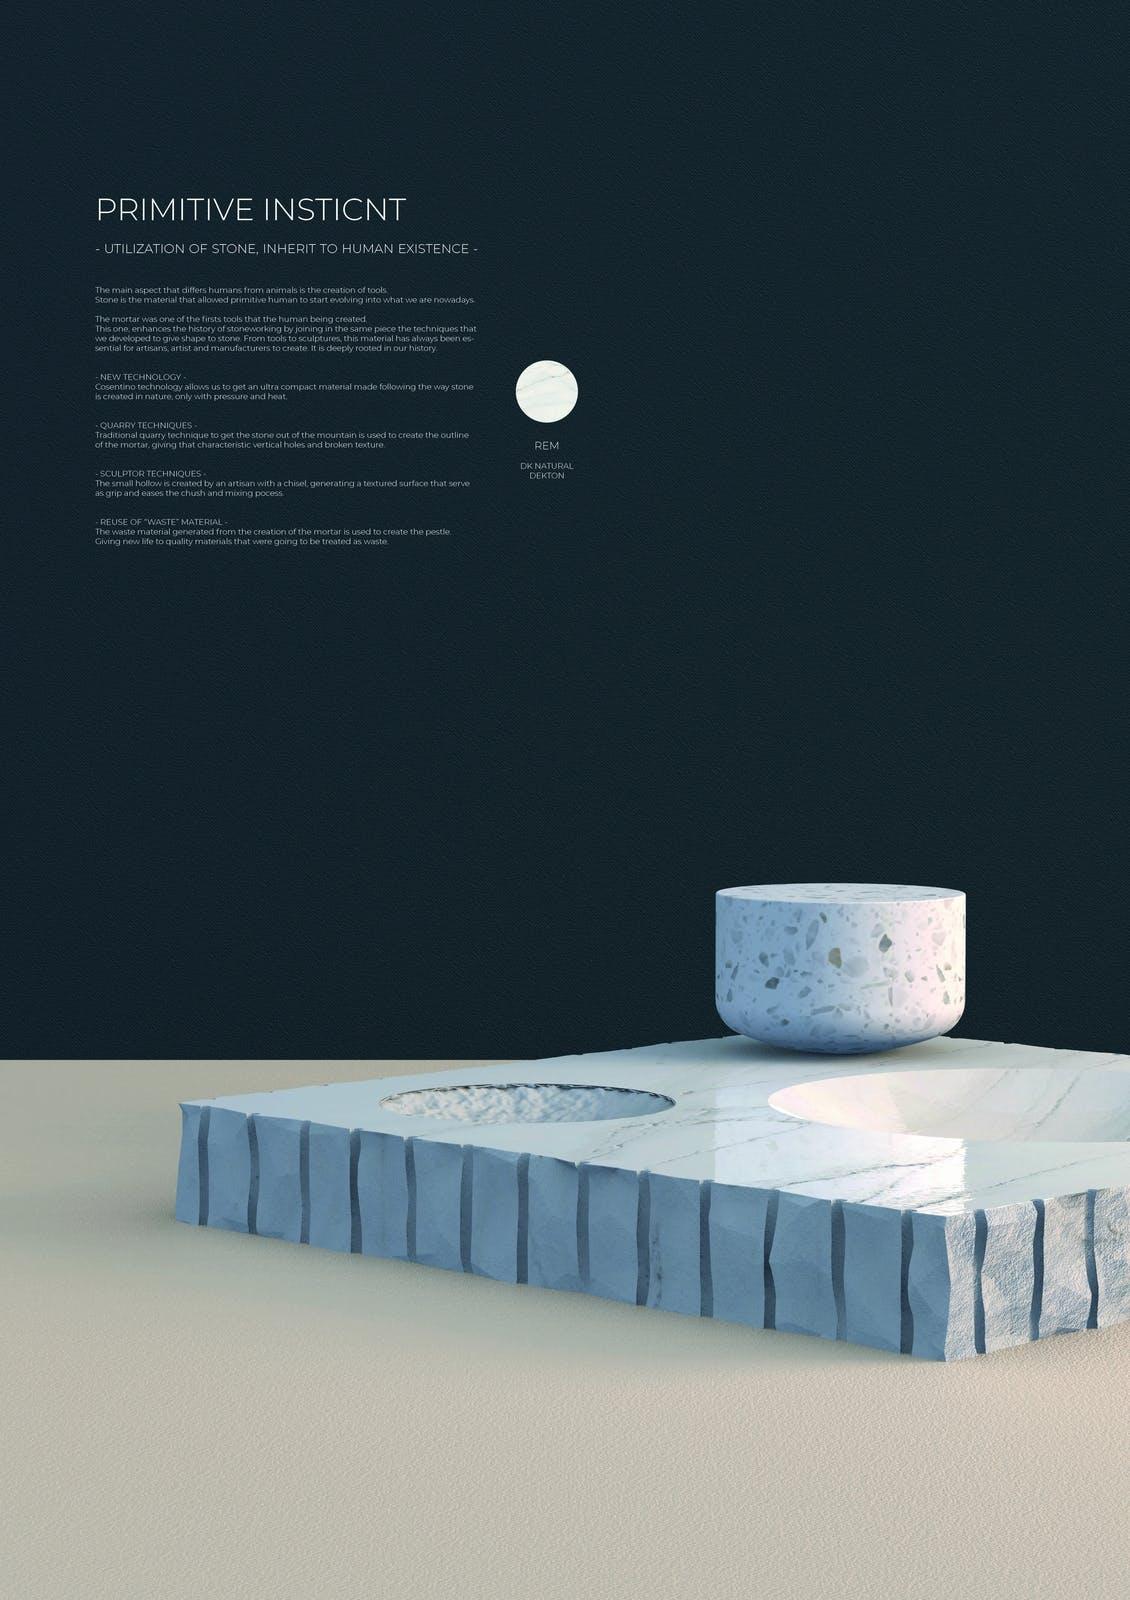 Image of 149 Primitive Instinct s 1 in Ganadores Cosentino Design Challenge 14 - Cosentino